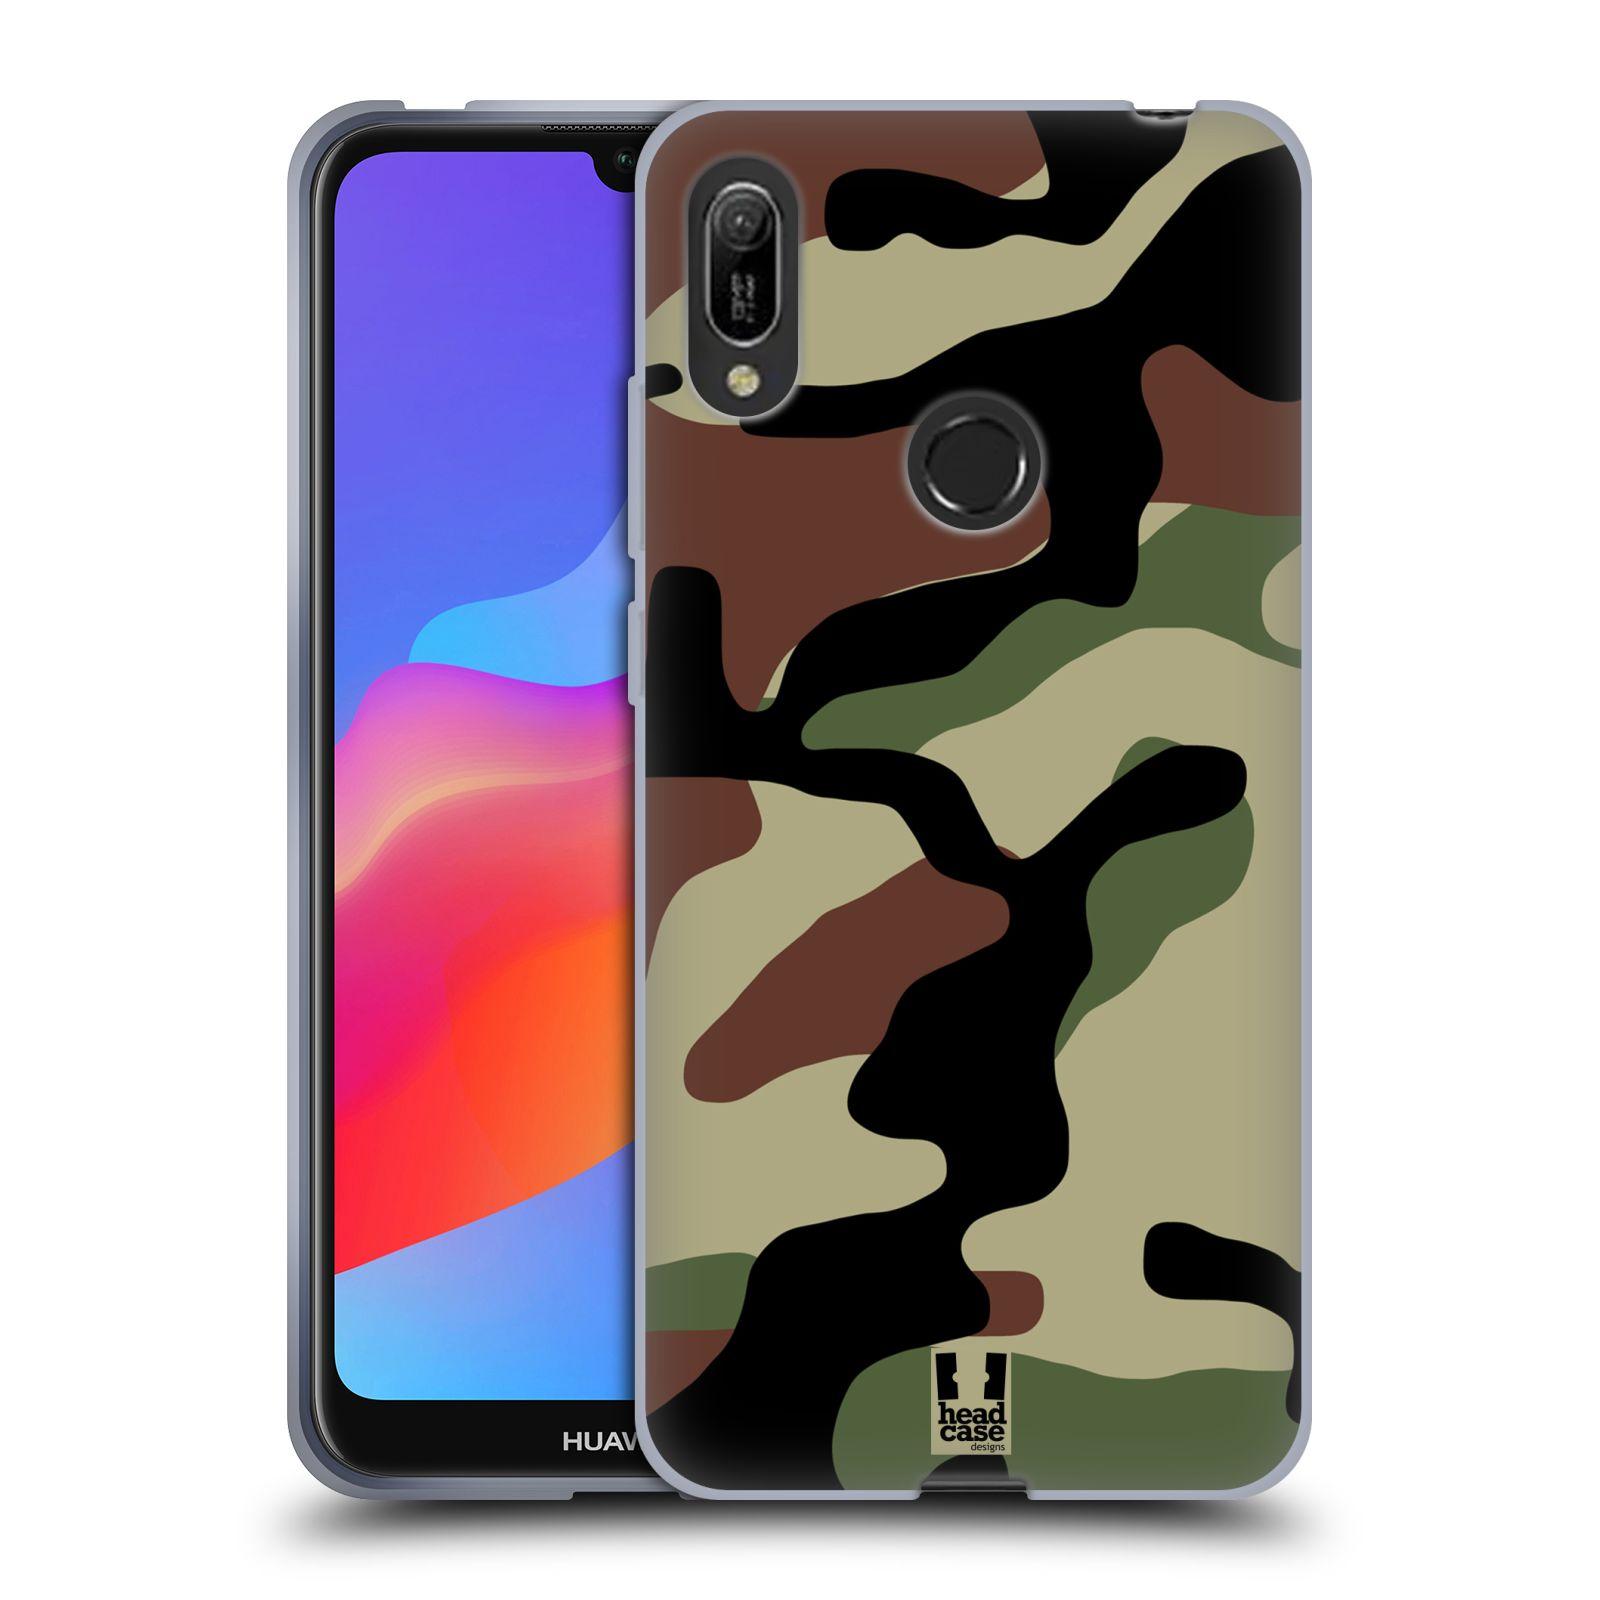 Silikonové pouzdro na mobil Huawei Y6 (2019) - Head Case - Maskáče